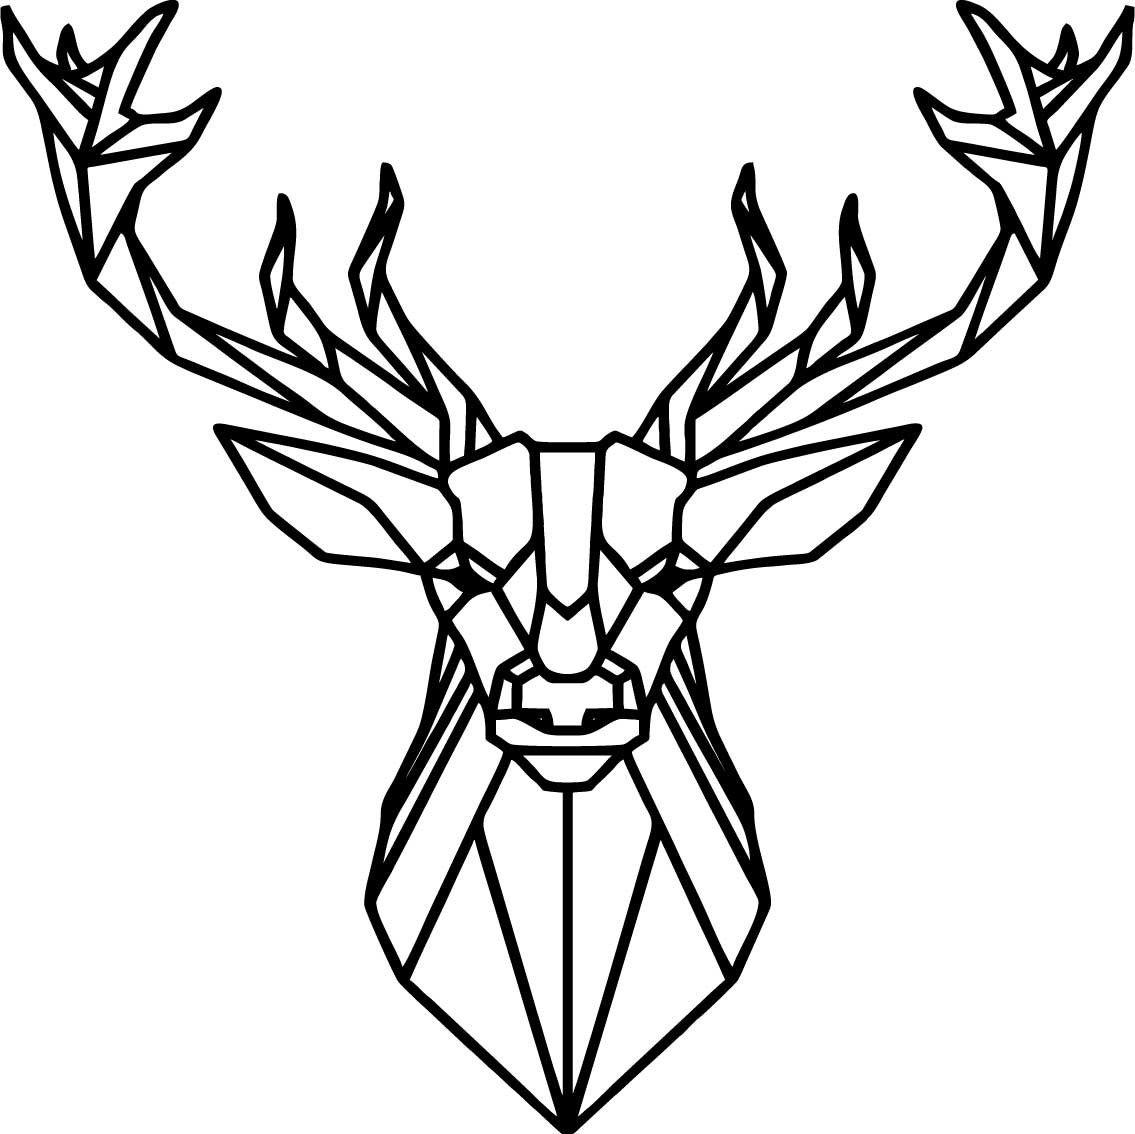 Pin By Sentop S R O On Cz 3d Nastenne Nalepovaci Hodiny Zrcadlove A Barevne Hodiny Na Stenu Dekorace Jako Obraz Geometric Animals Geometric Deer Geometric Art